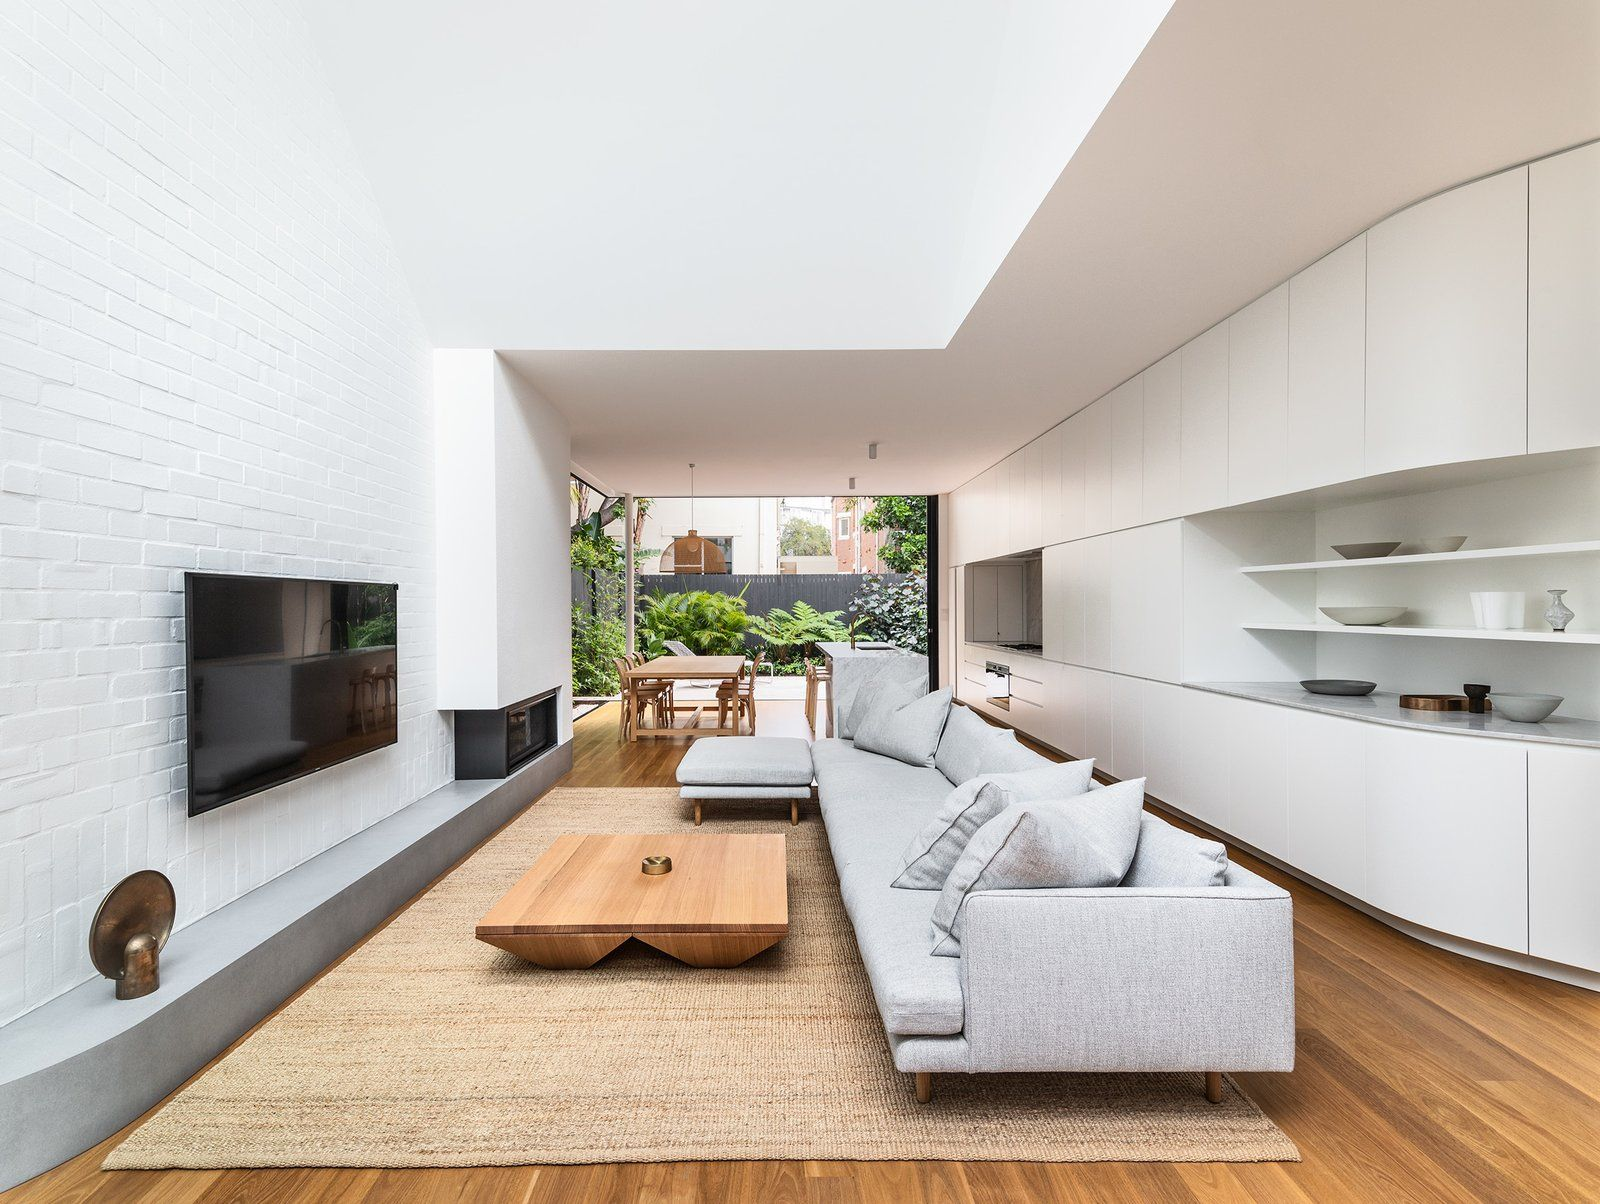 Modern home with living room corner fireplace sofa gas burning